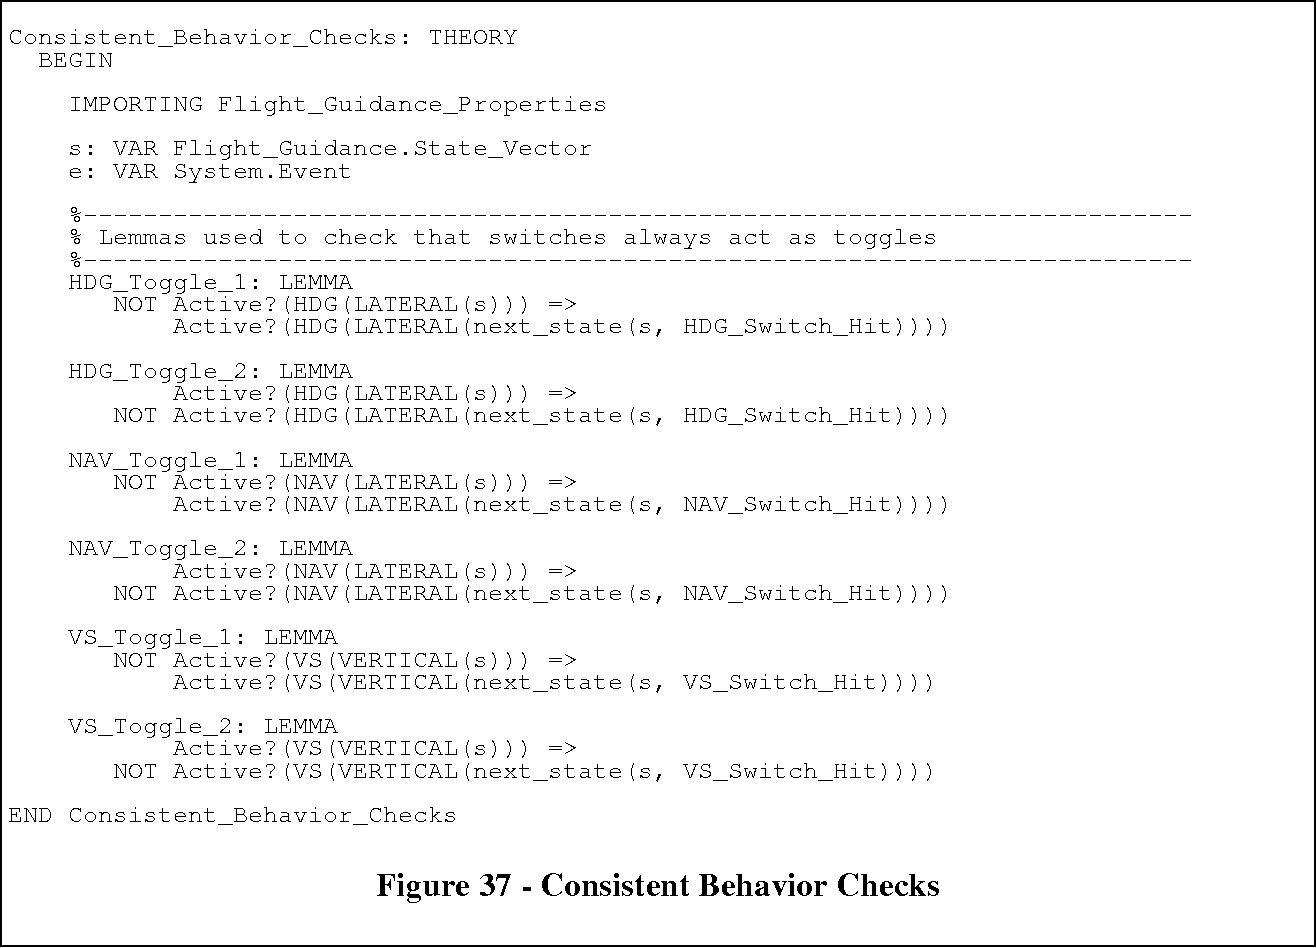 Figure 37 - Consistent Behavior Checks